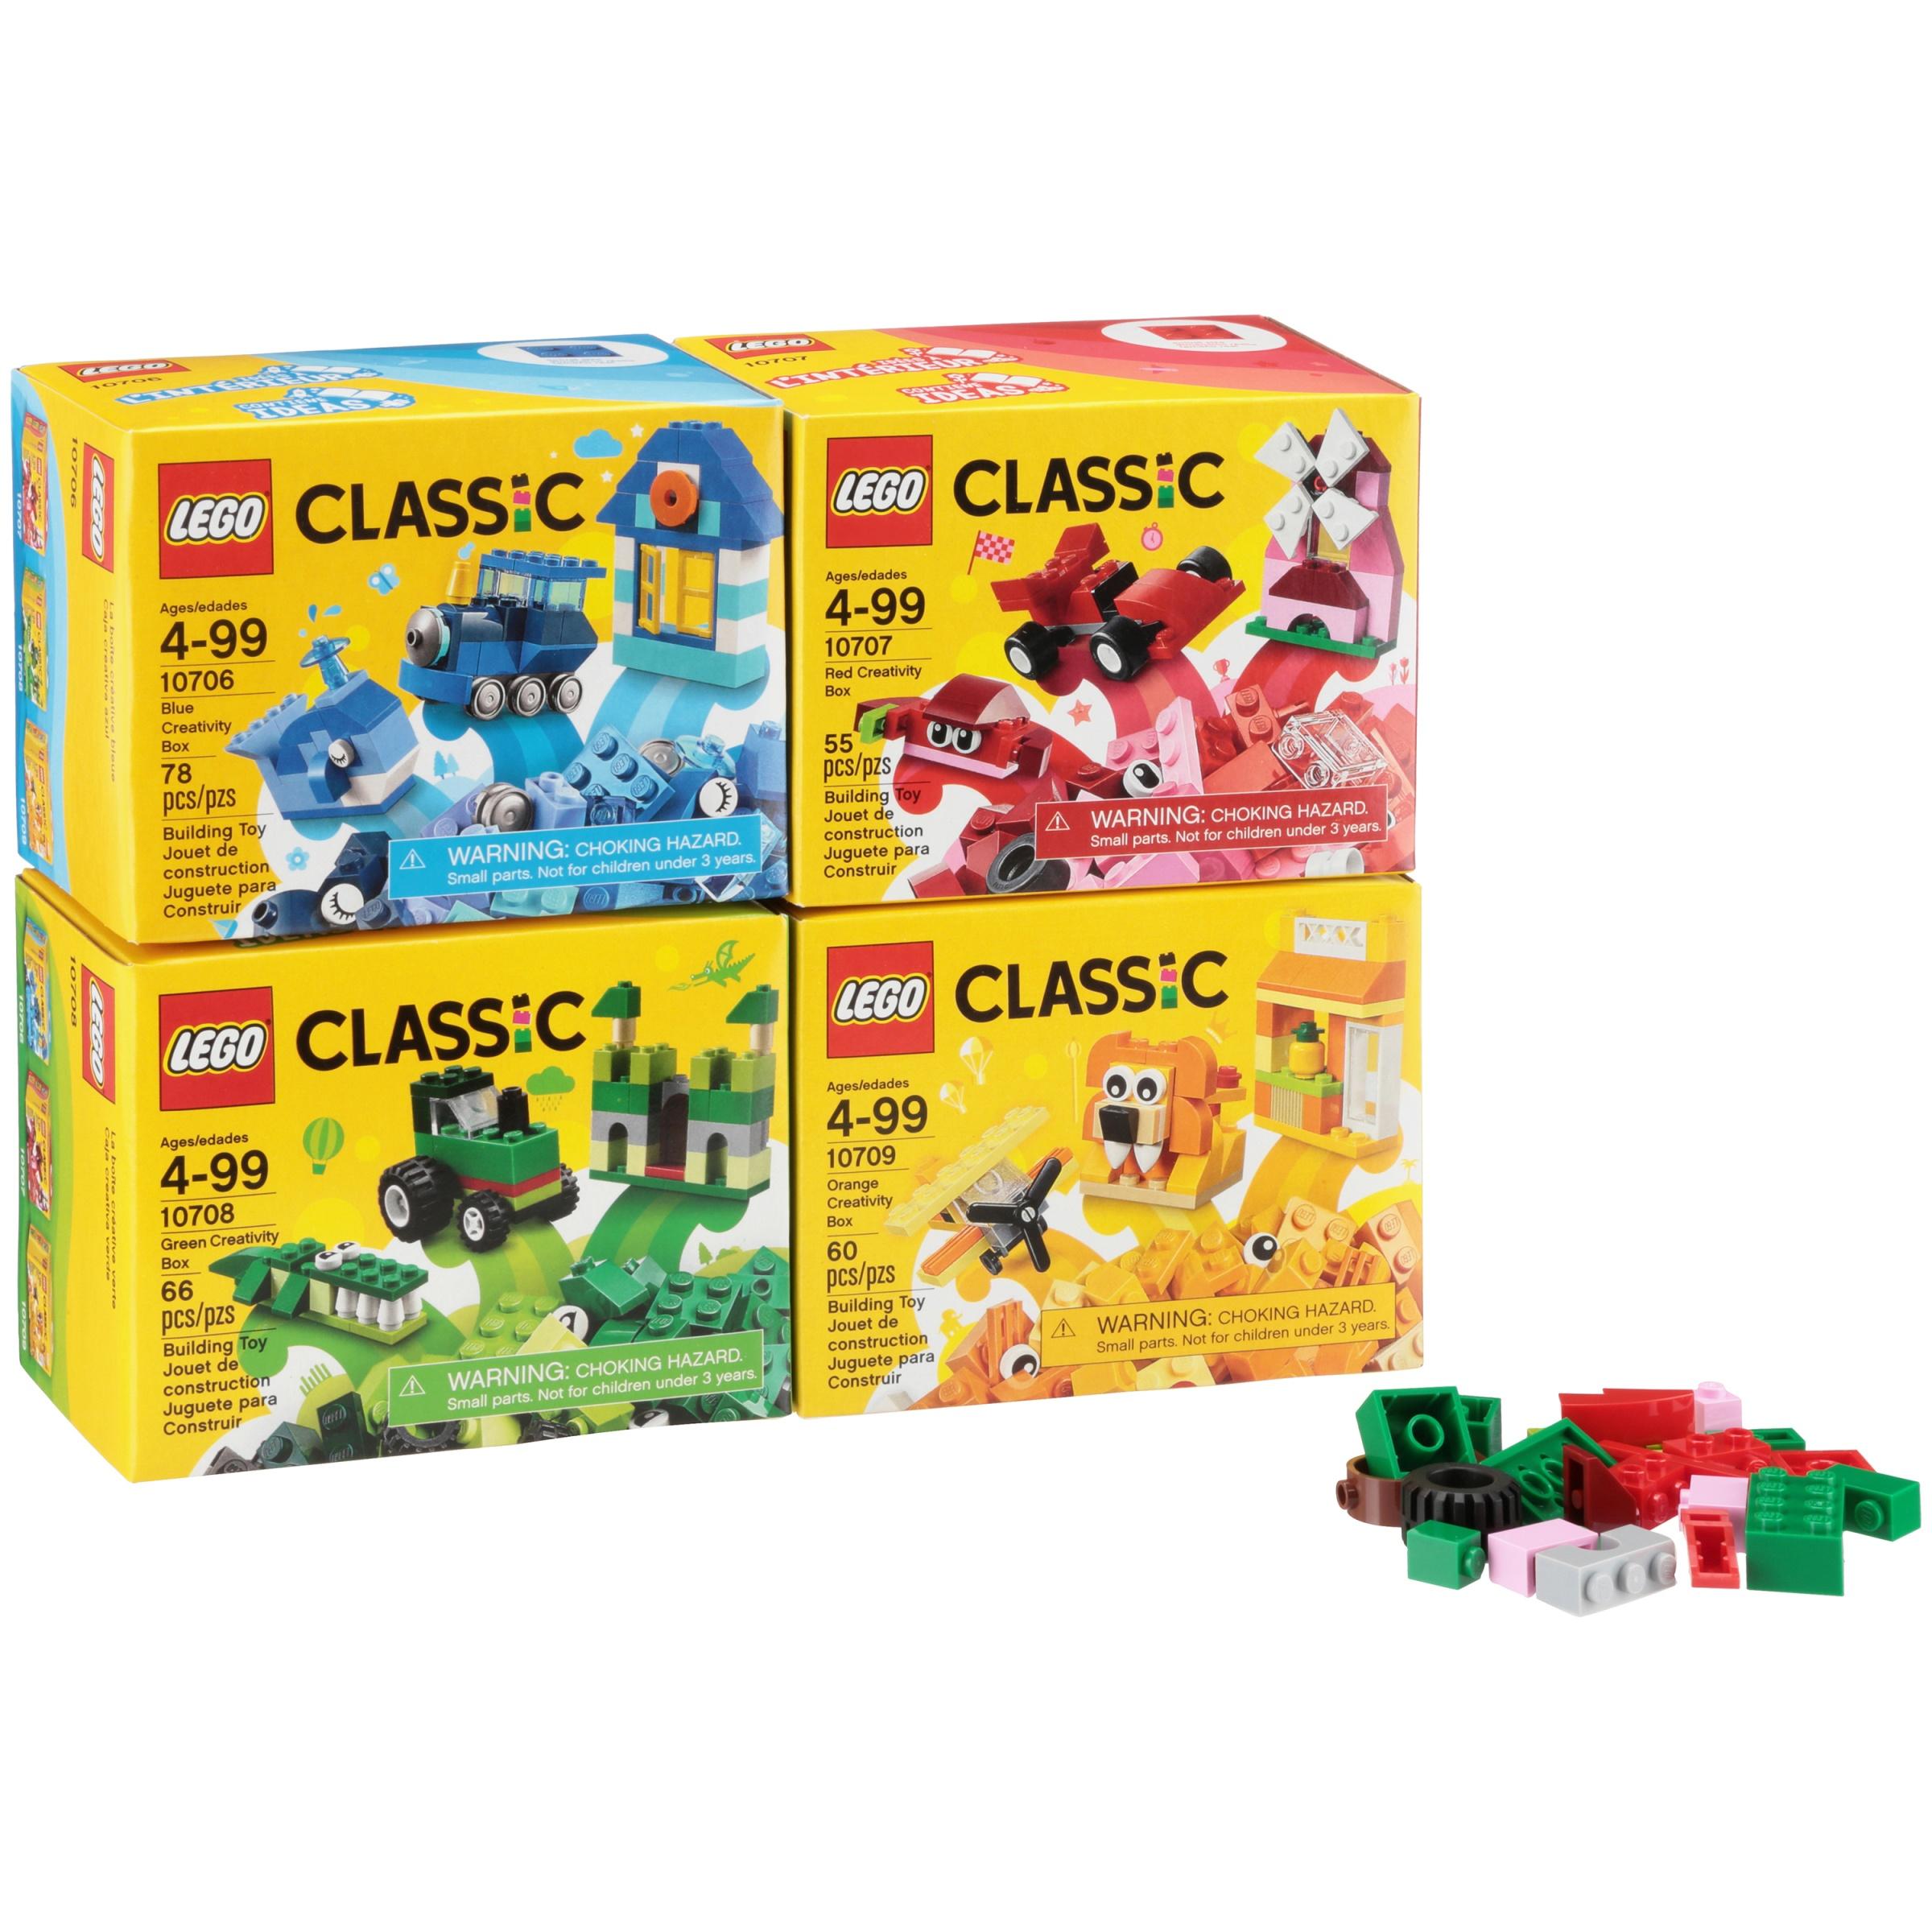 LEGO CLASSIC QUAD 4 PACK 66554 RED GREEN BLUE ORANGE 10706 10707 10708 10709